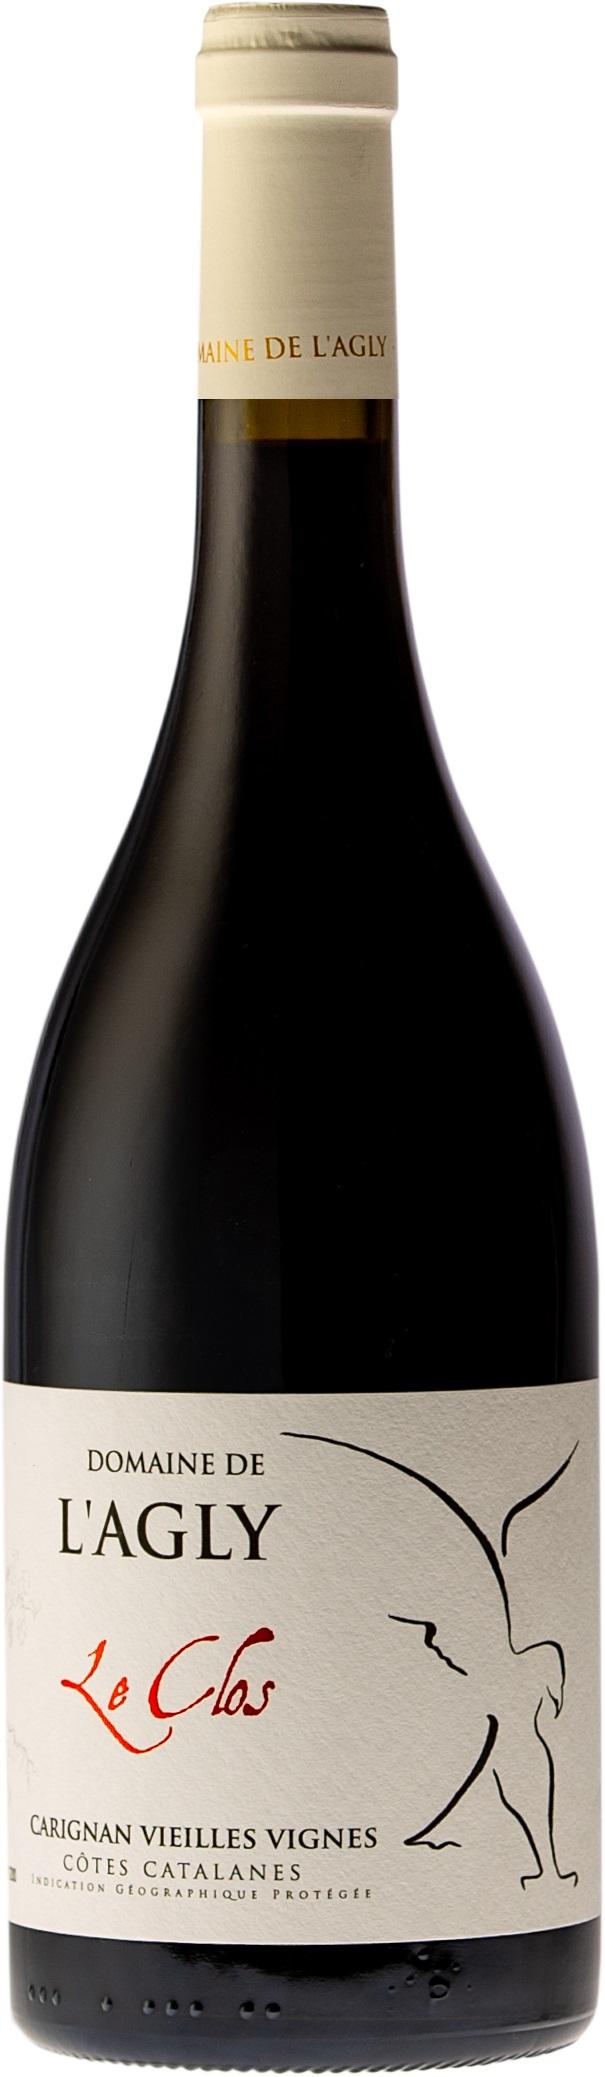 Le Clos Carignan Vieilles Vignes